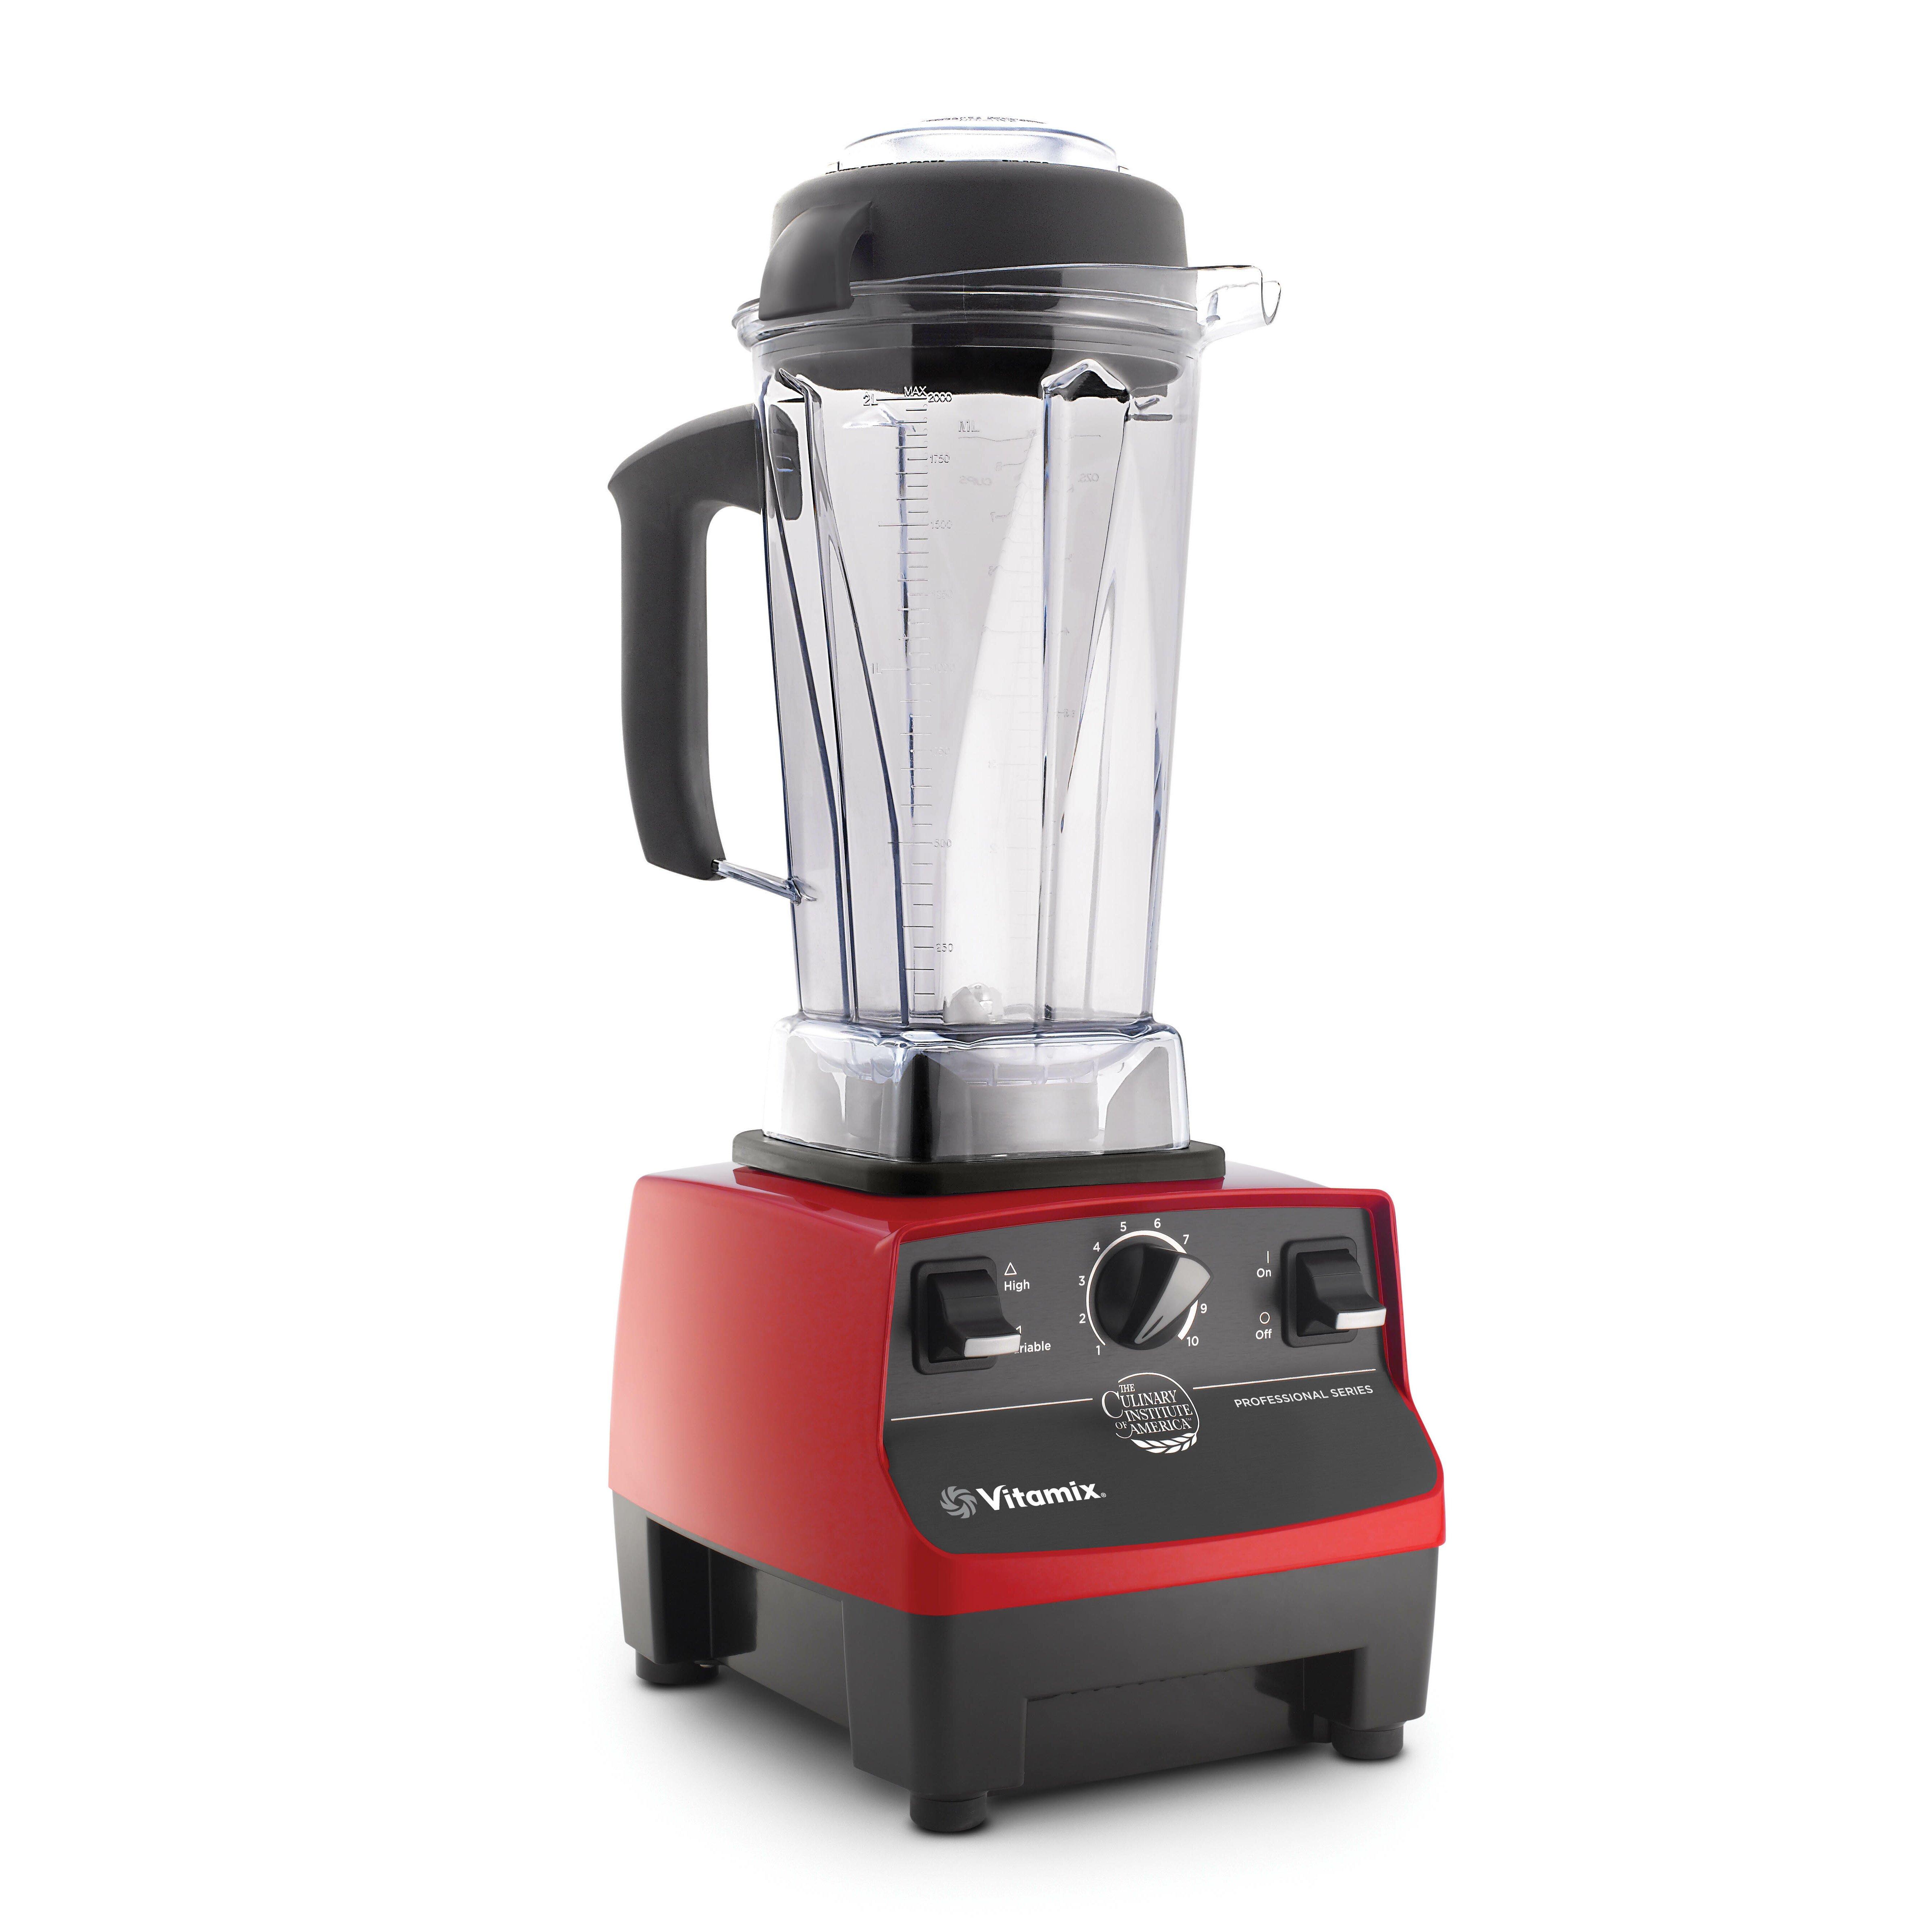 Cuisinart smartpower duet blender and food processor - Vitamix Cia Professional Series 64 Oz Blender